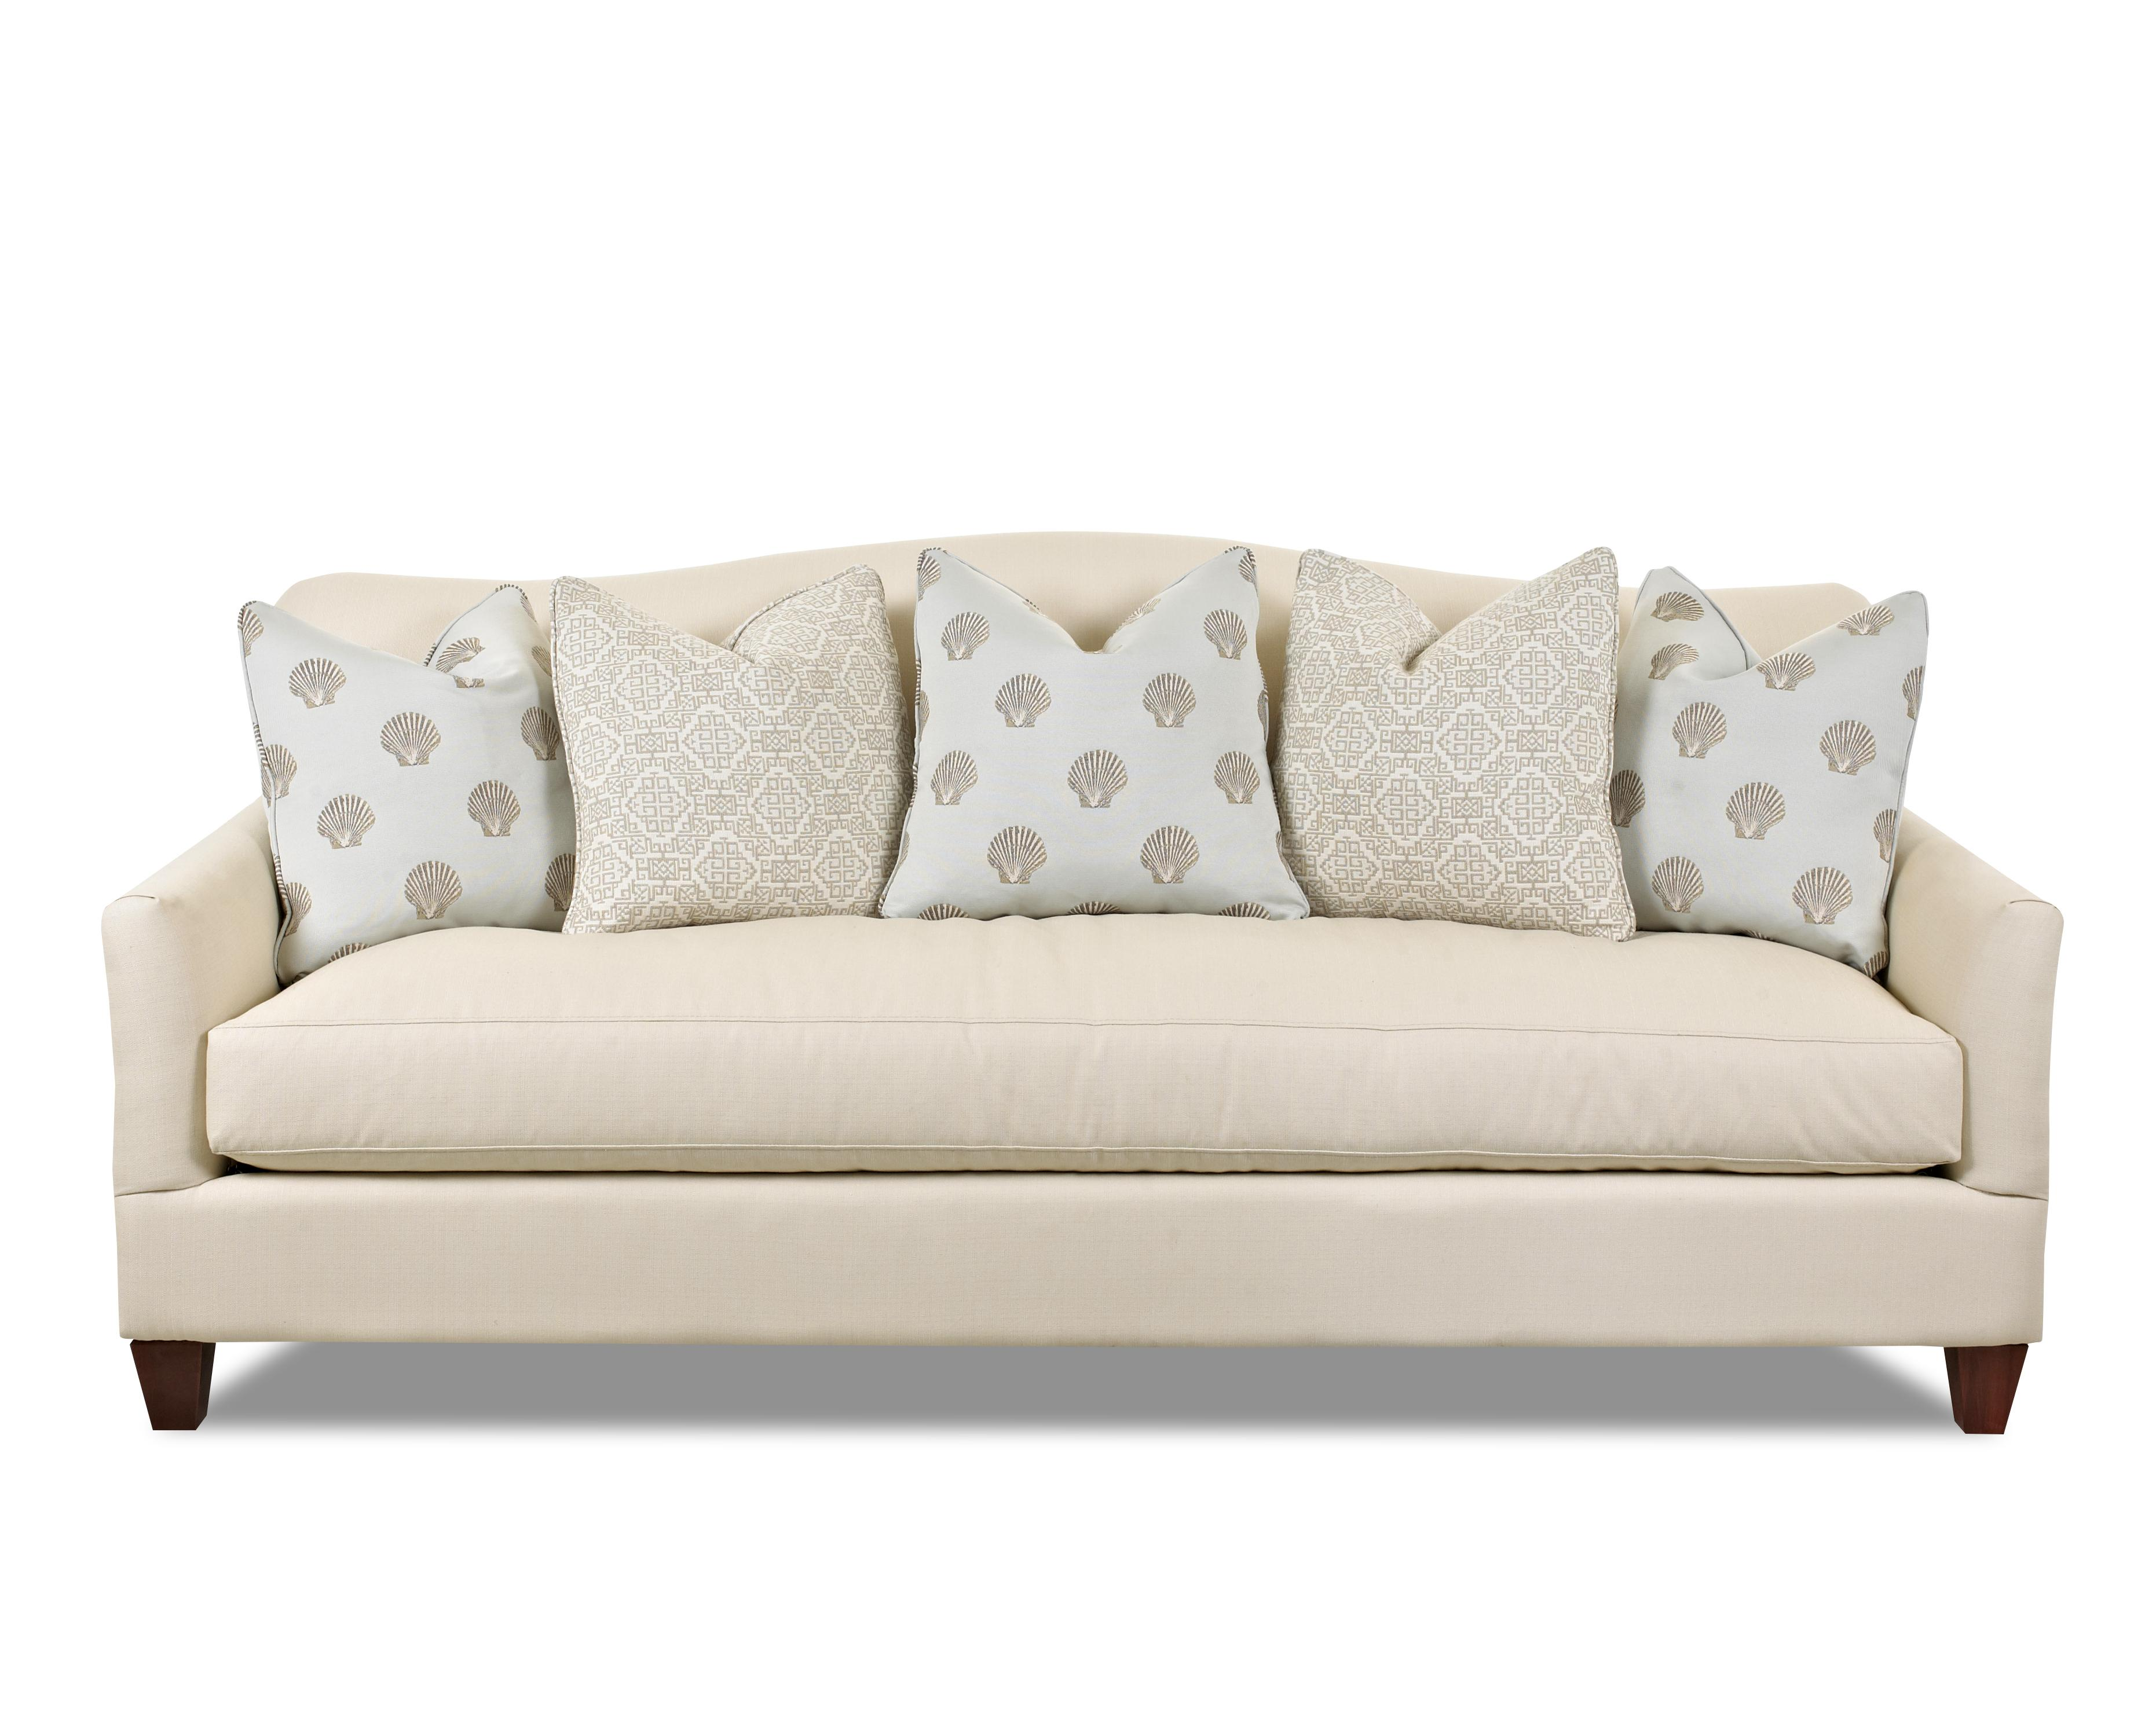 Sofa for Modern bench seating living room